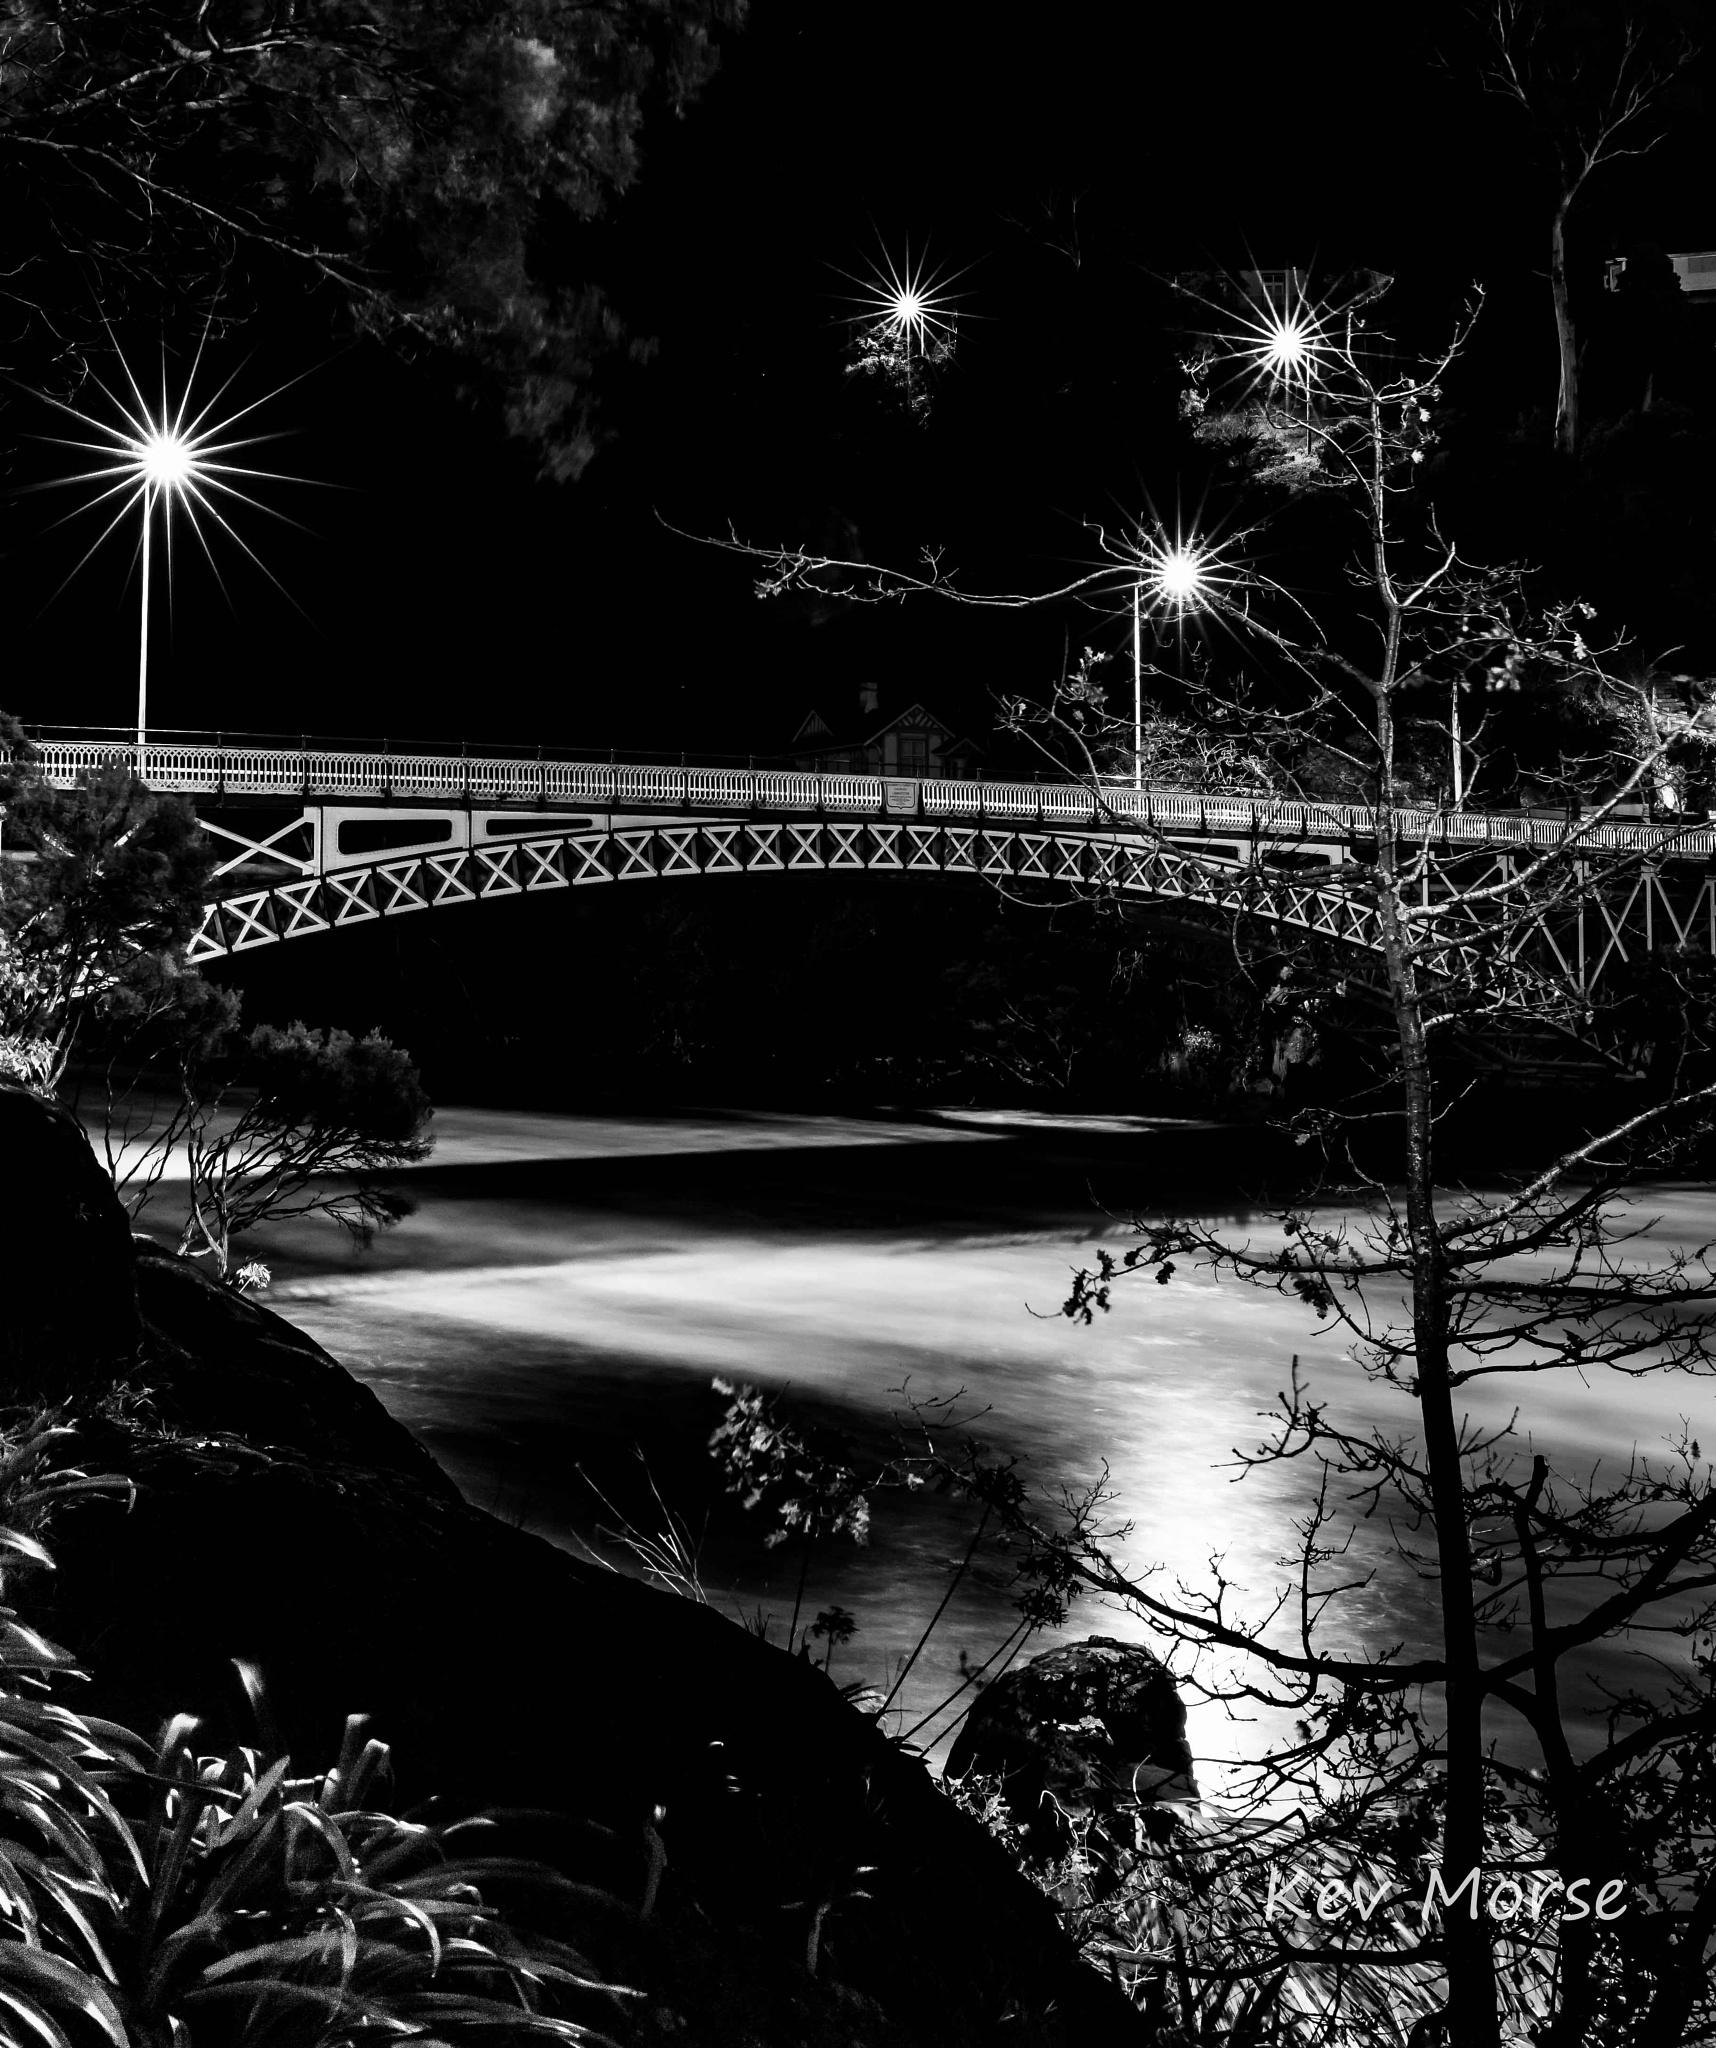 Kings Bridge, Launceston, Tasmania by Kev Morse